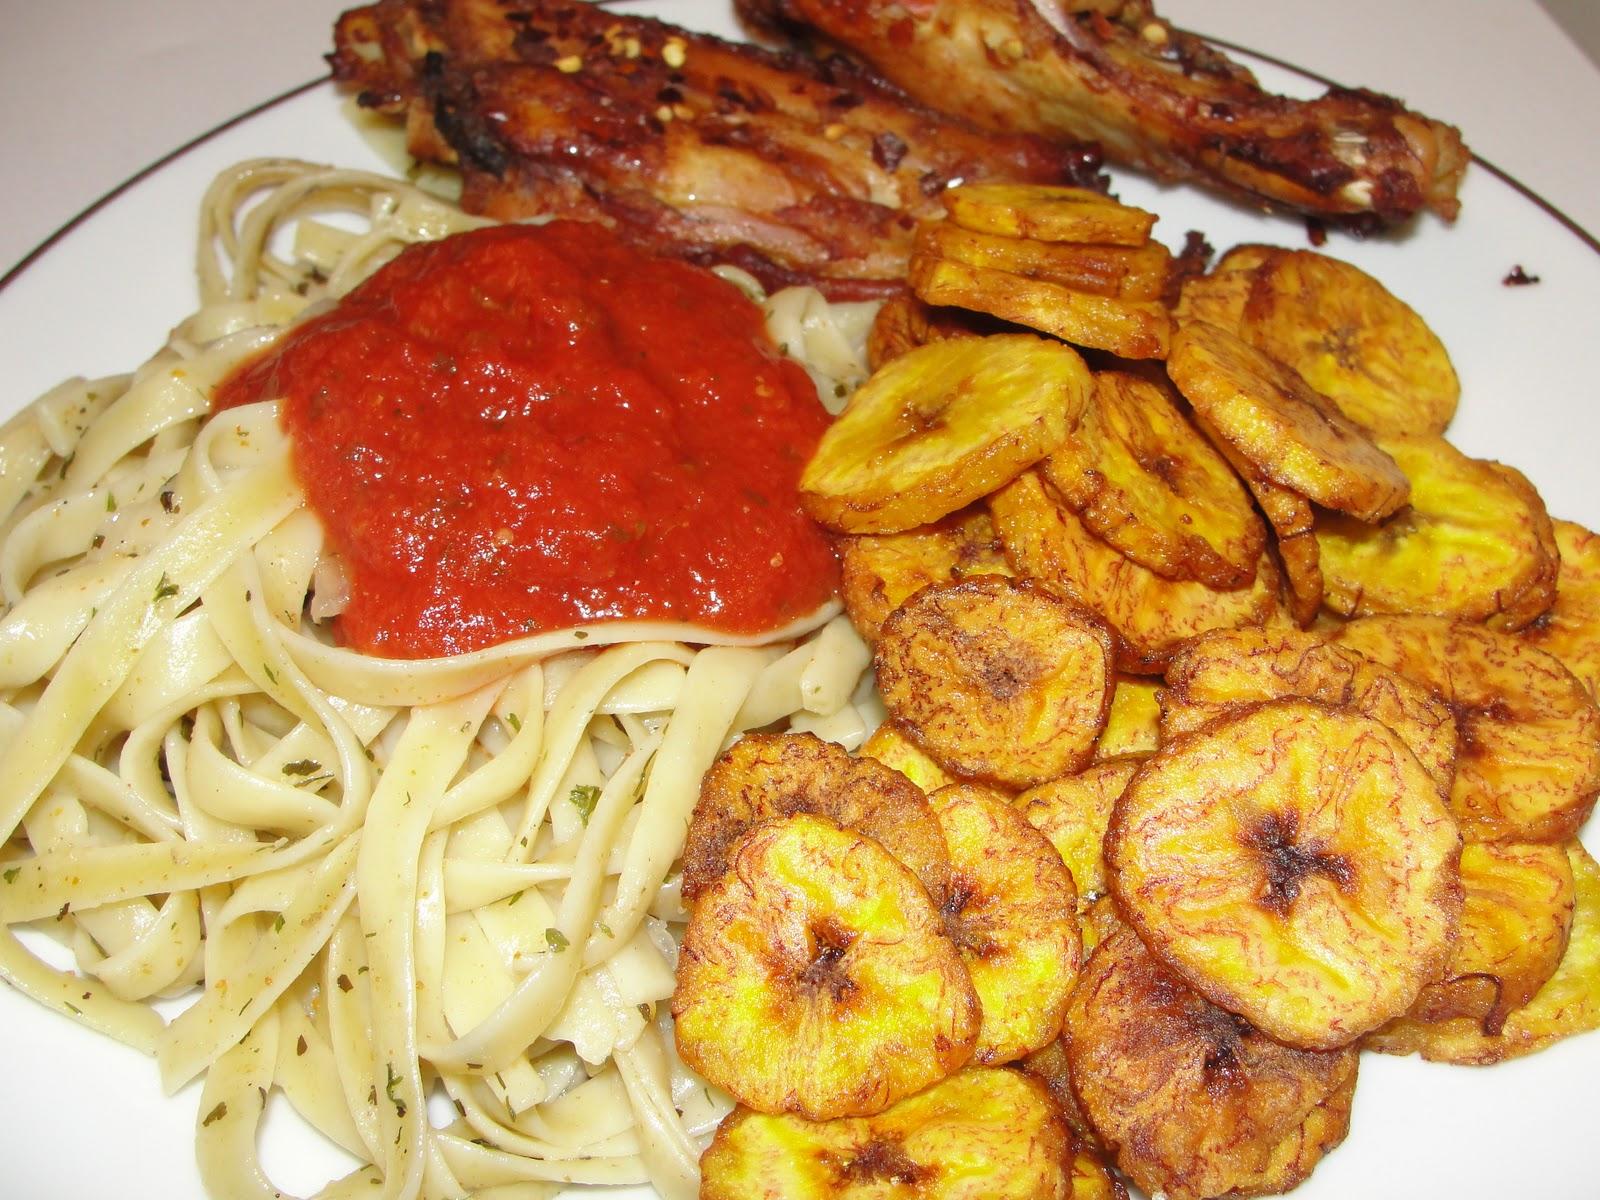 Modern african cuisine fettucini 9ja style for African cuisine history